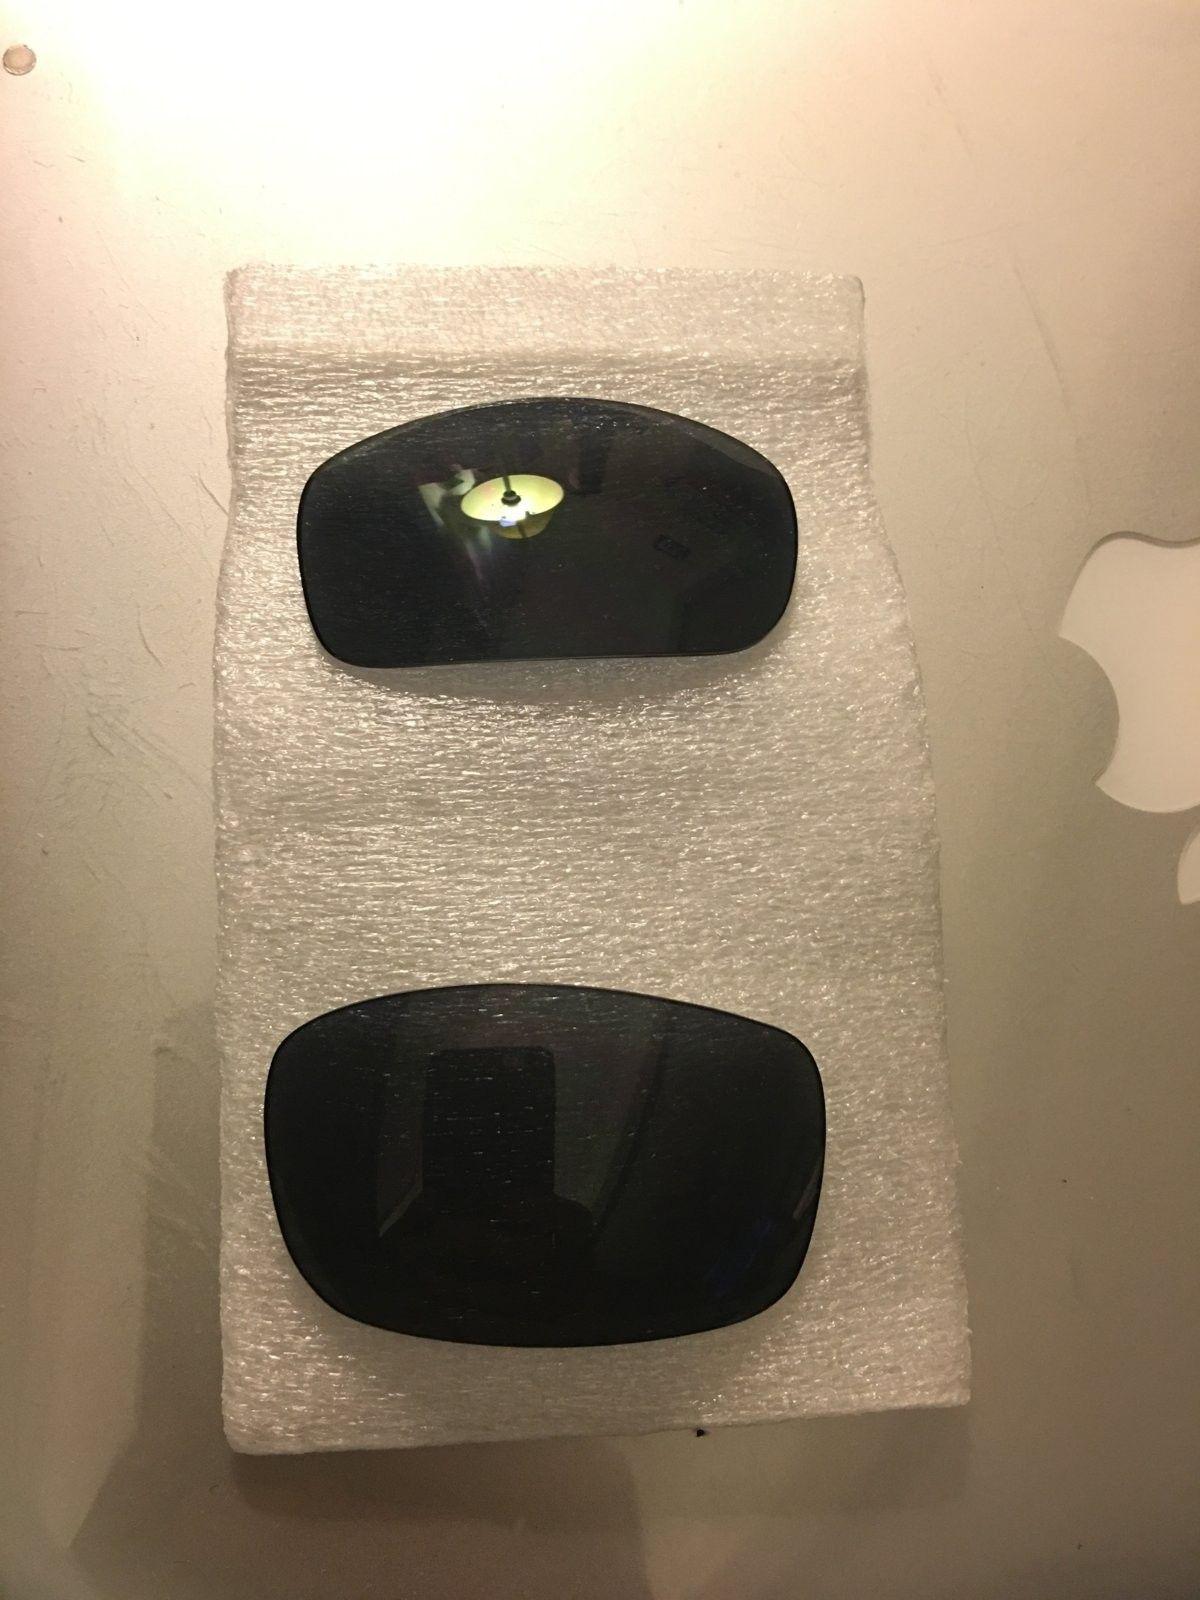 Xmetal lenses for sale - image.jpeg